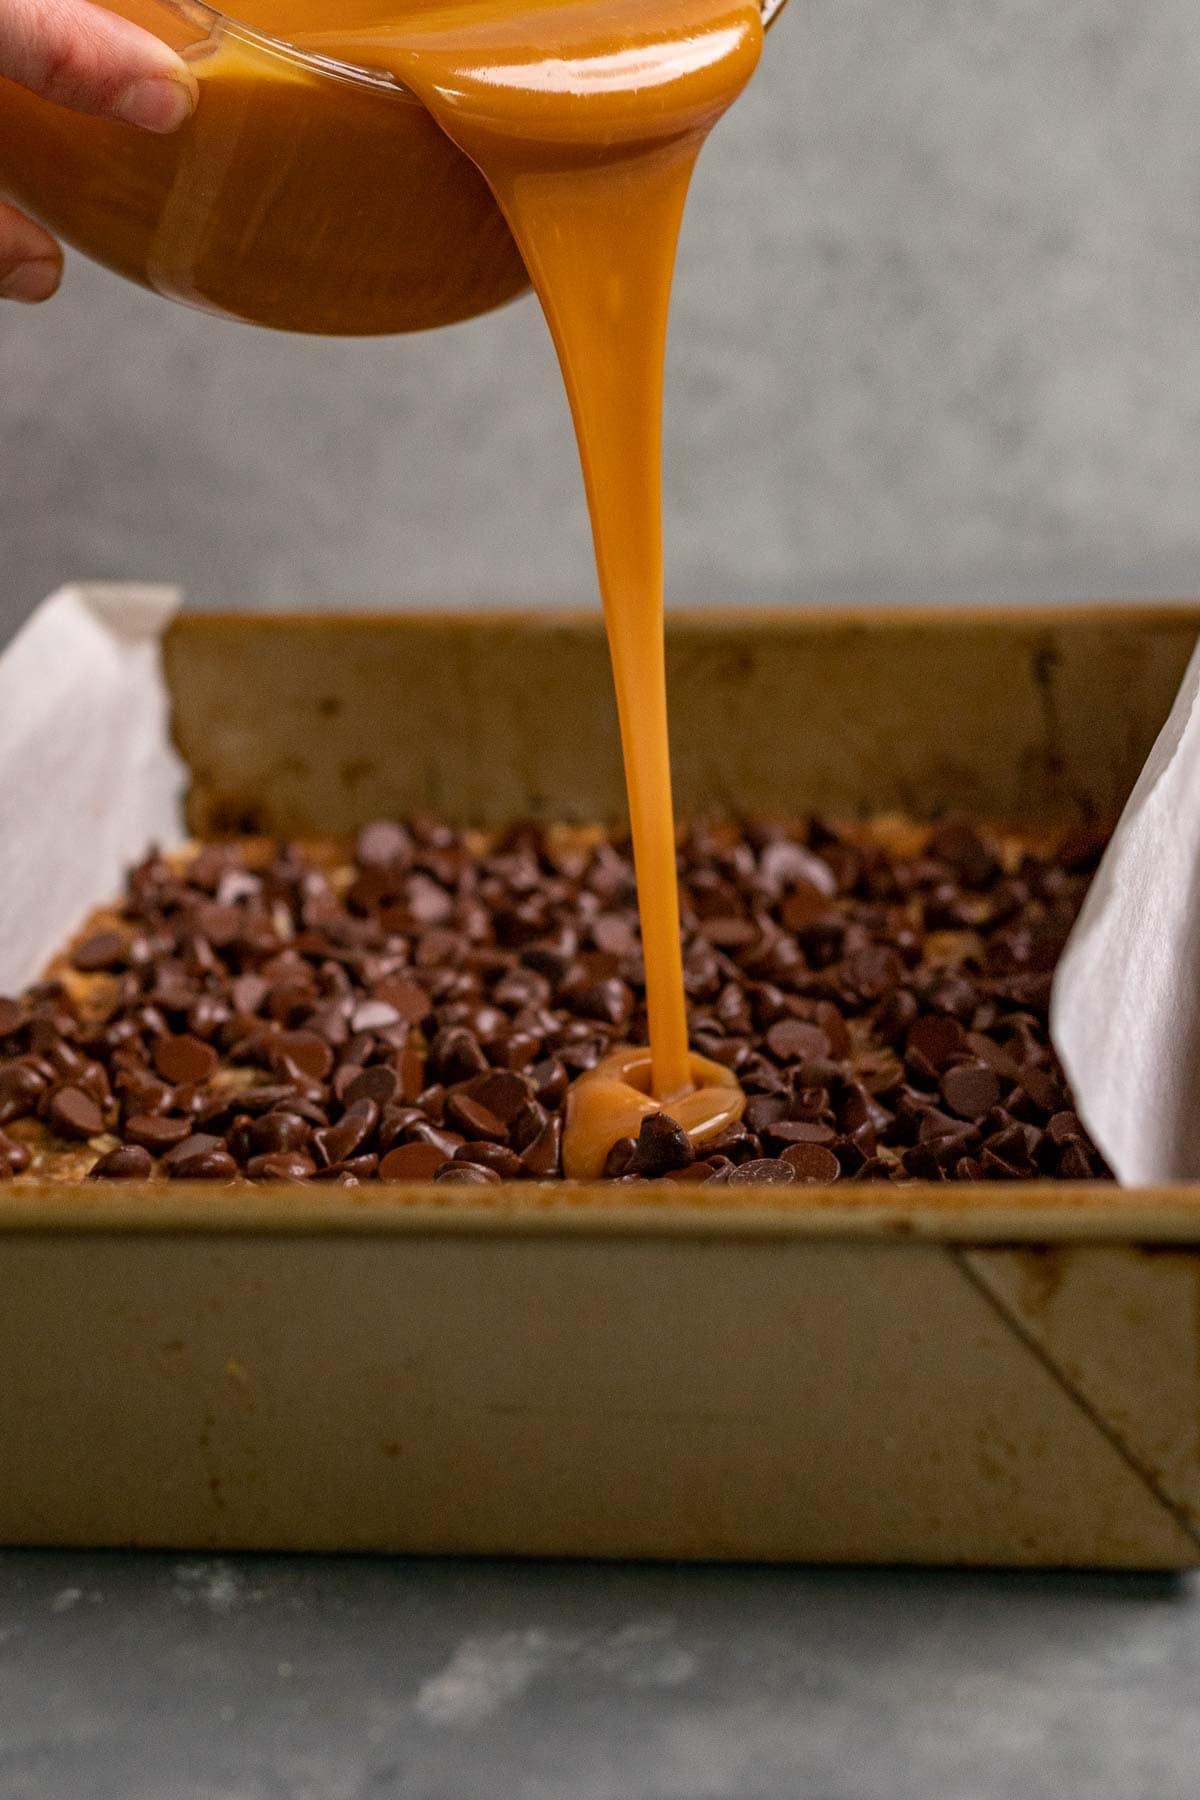 Caramel Chocolate Bars caramel sauce pouring onto chocolate chip layer